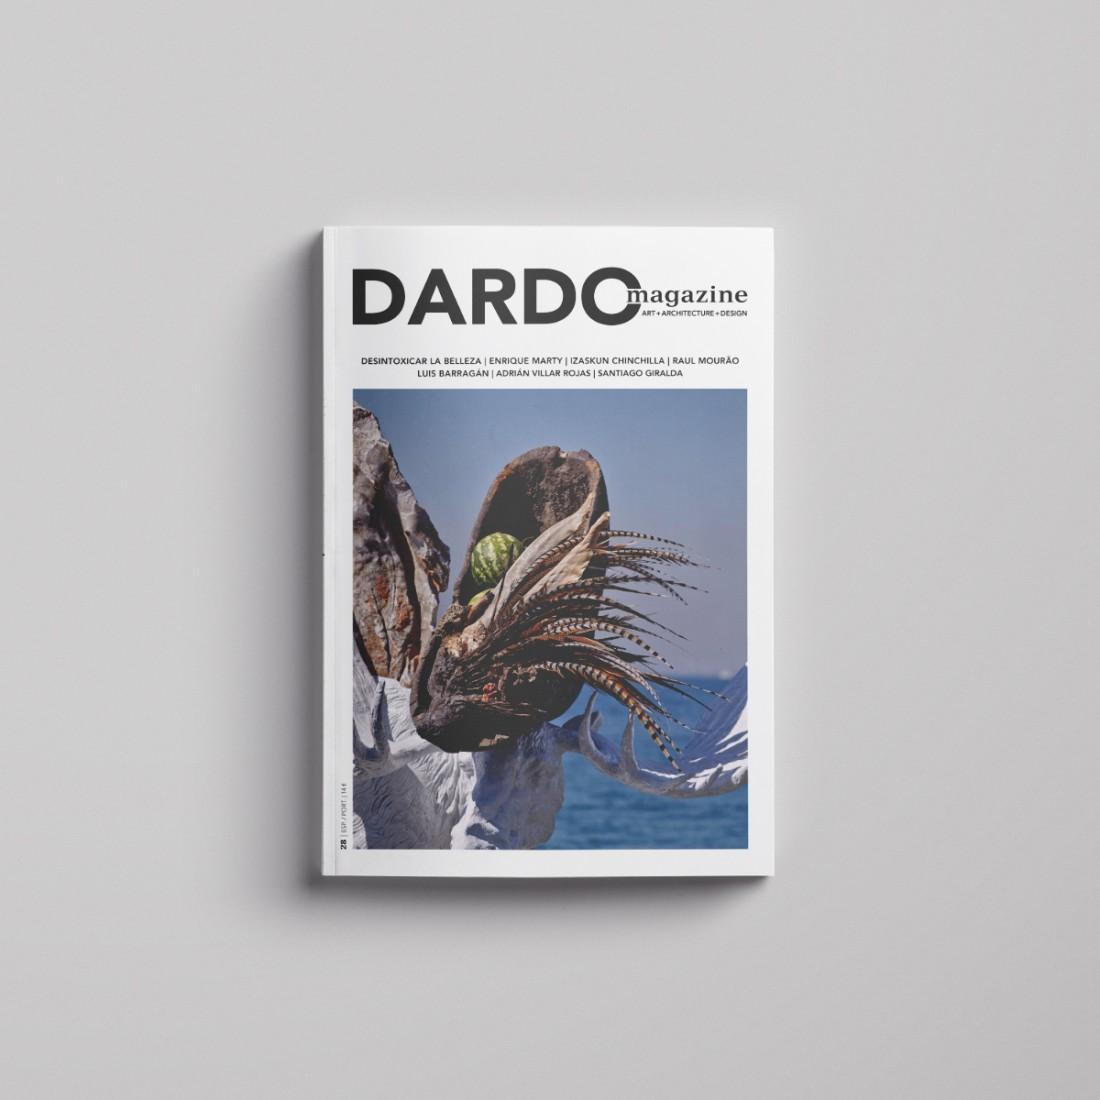 DARDOmagazine 28